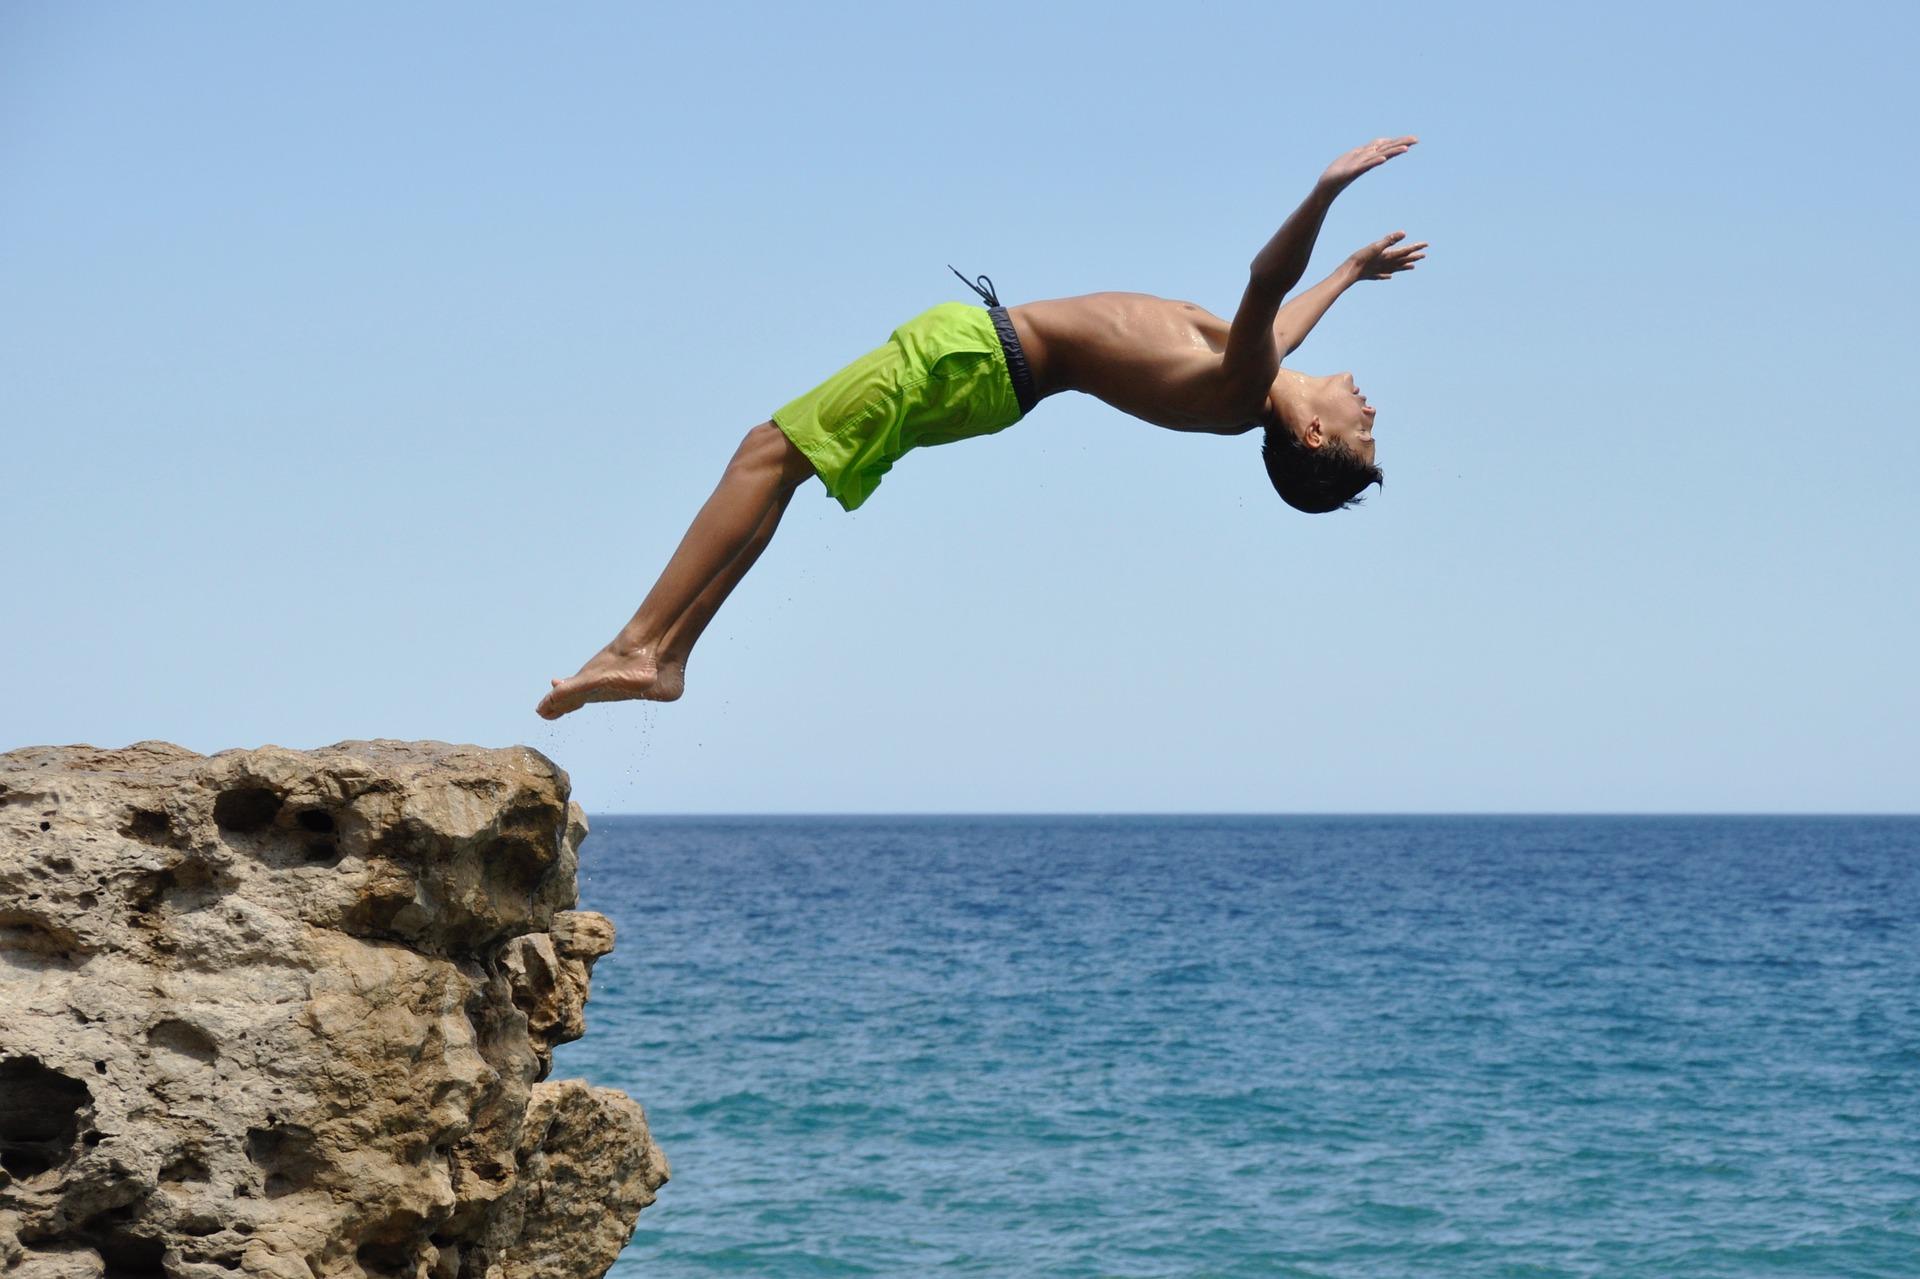 diving-1551764_1920.jpg